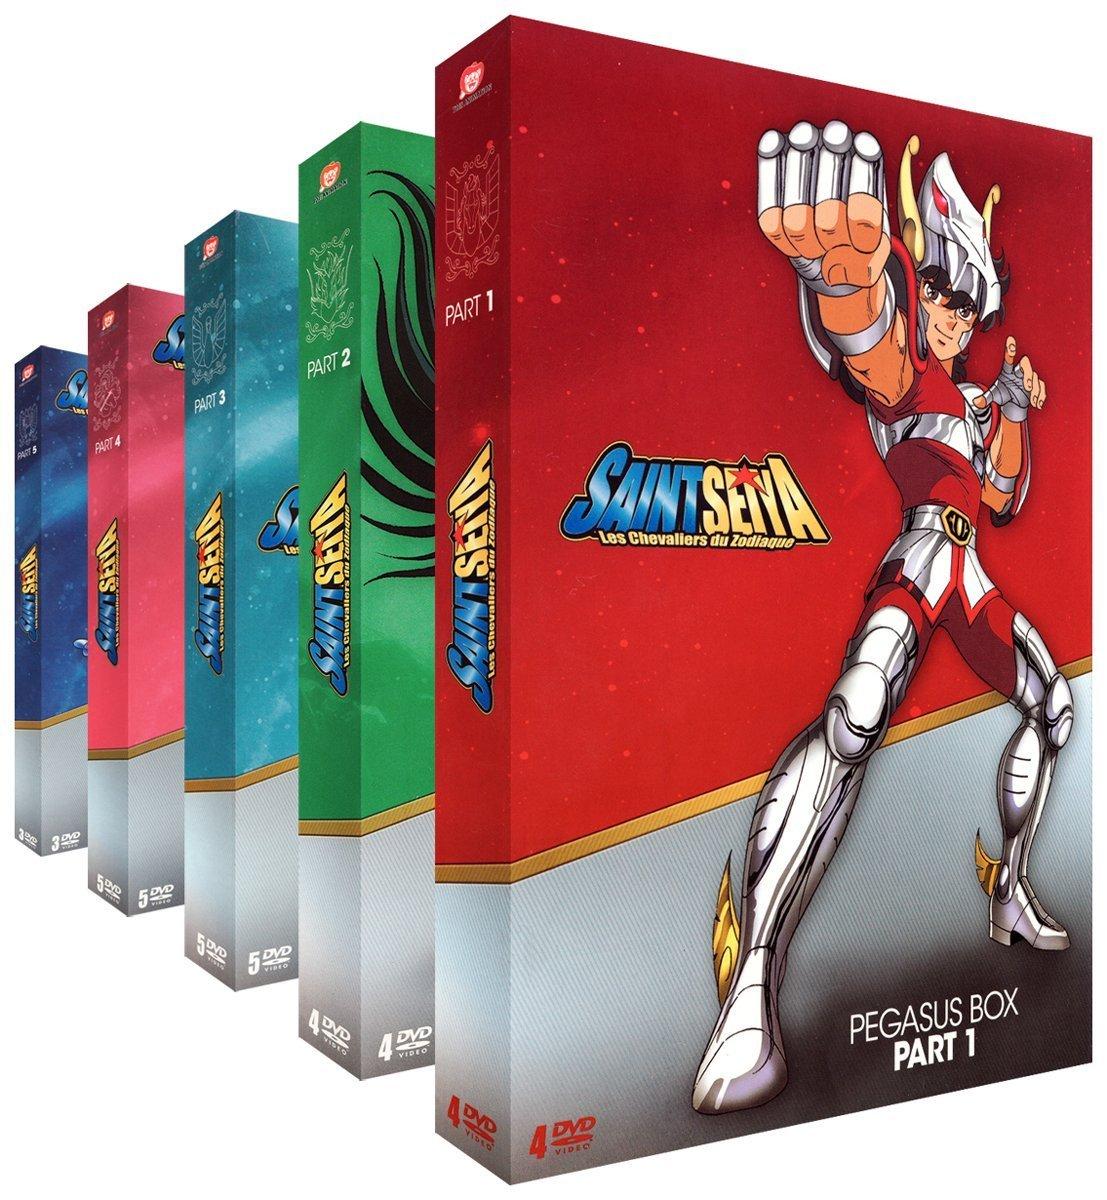 Knights Of The Zodiac dvd TV DVD-BOX NEW